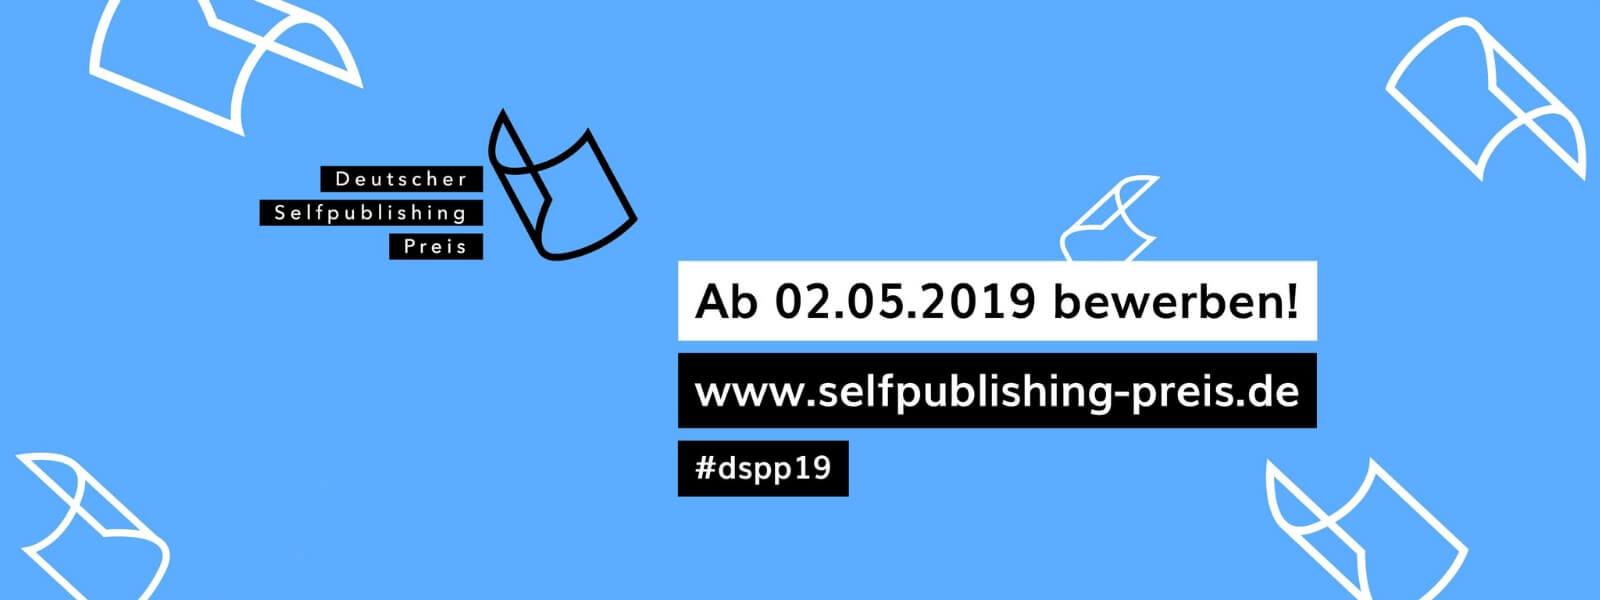 deutscher Selfpublishing Preis 2019